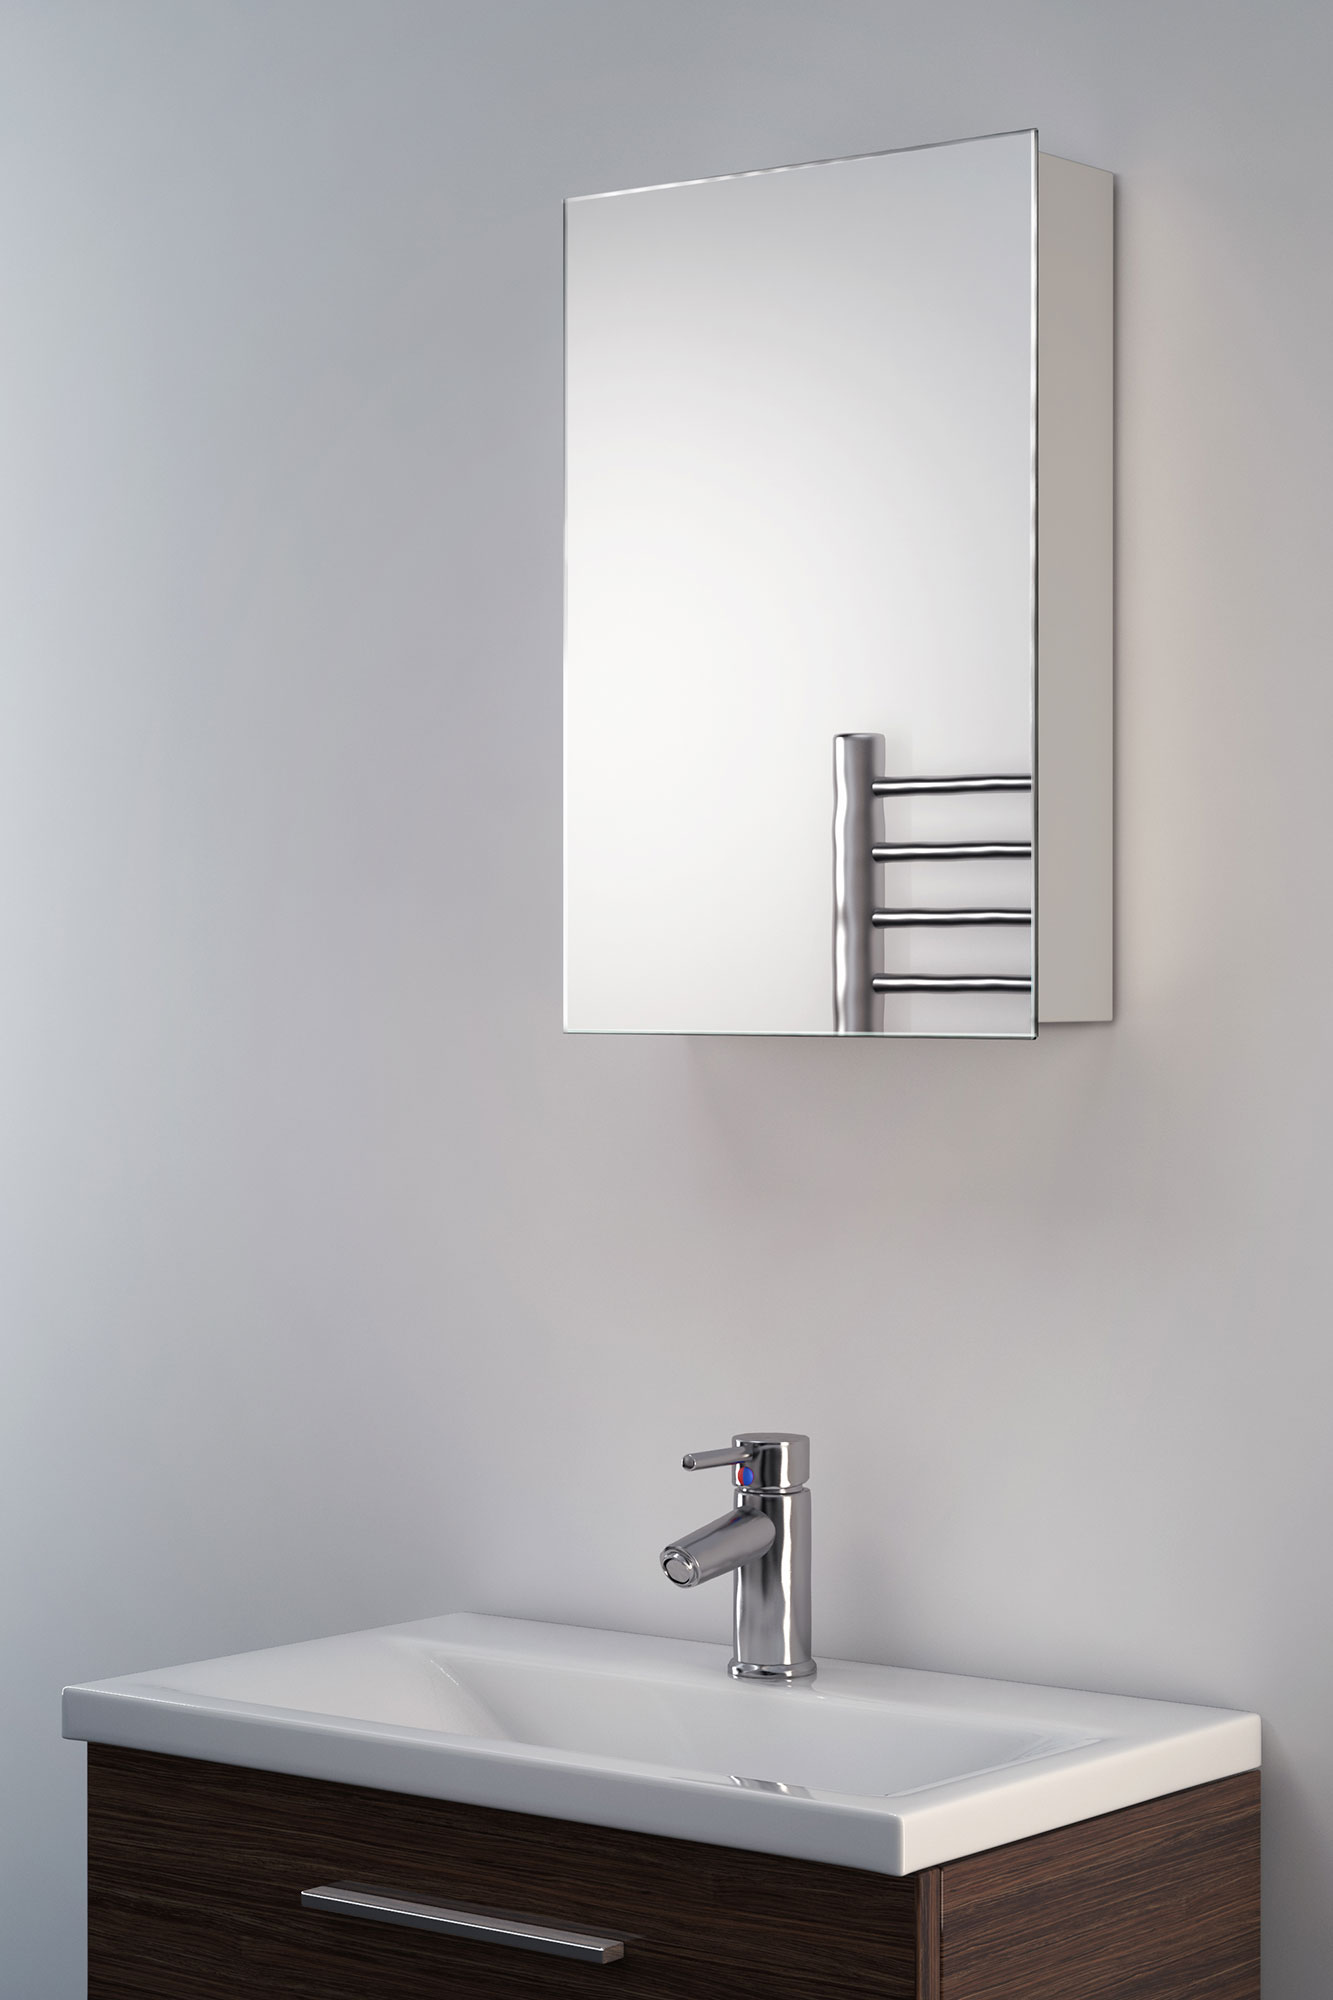 Alban Non-Illuminated Bathroom Mirror Cabinet k136 5055687001265 | eBay